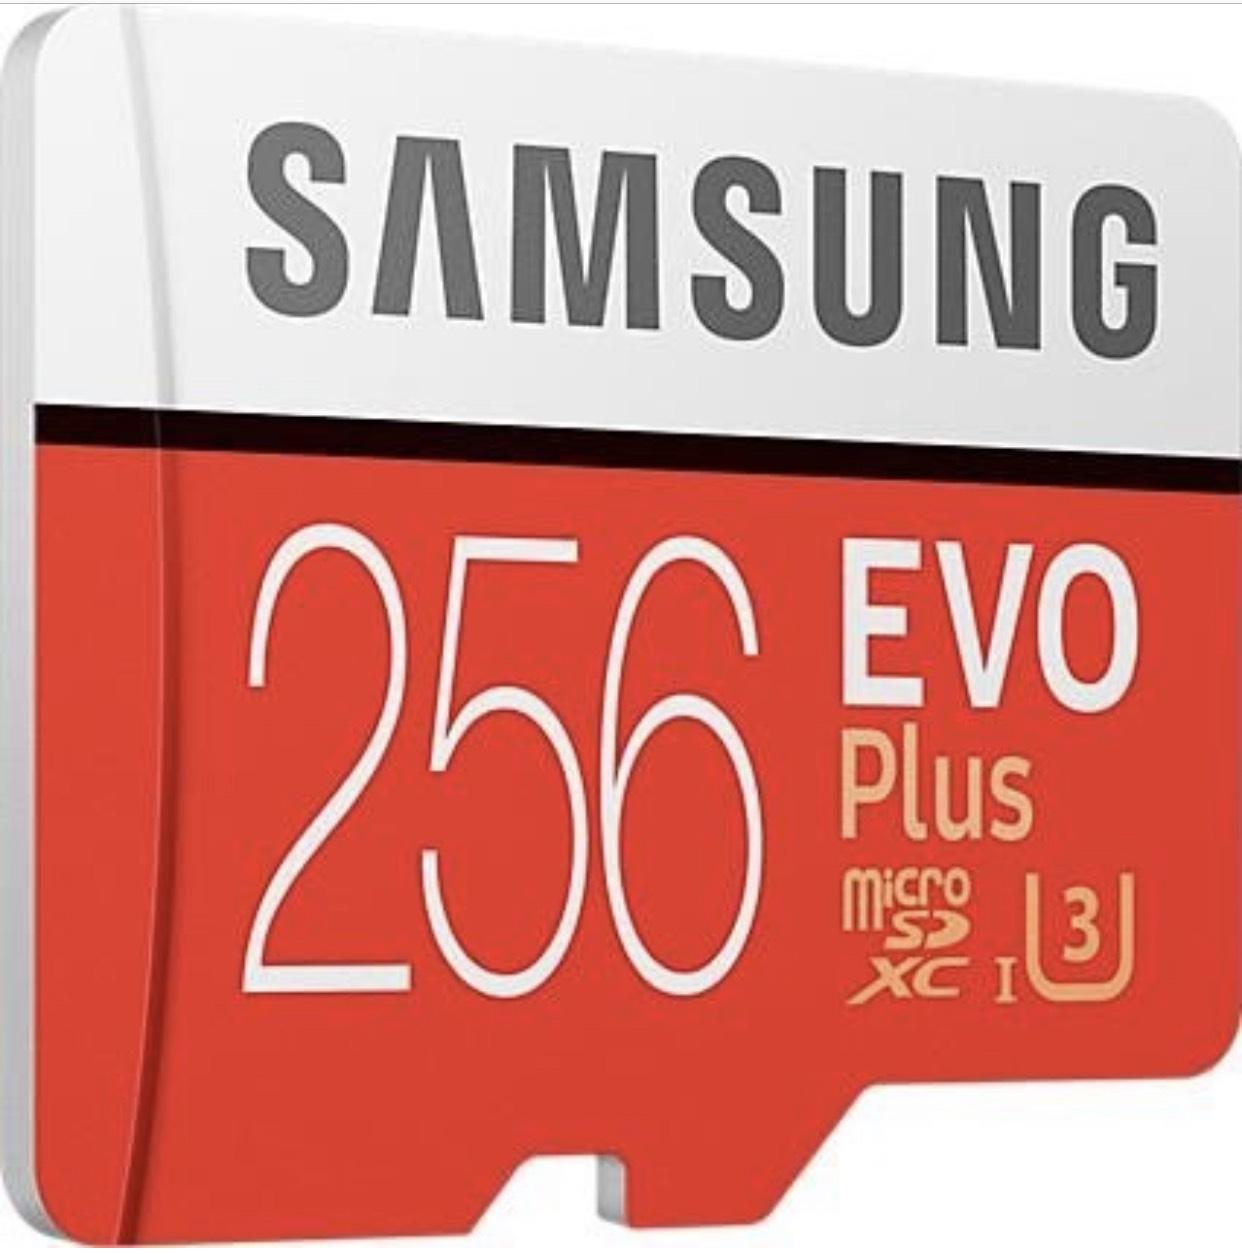 Samsung Micro SDXC 256GB Class 10 EVO Plus U3 Speicherkarte (inkl. SD Adapter, bis zu 100MB/s) für 66,55€